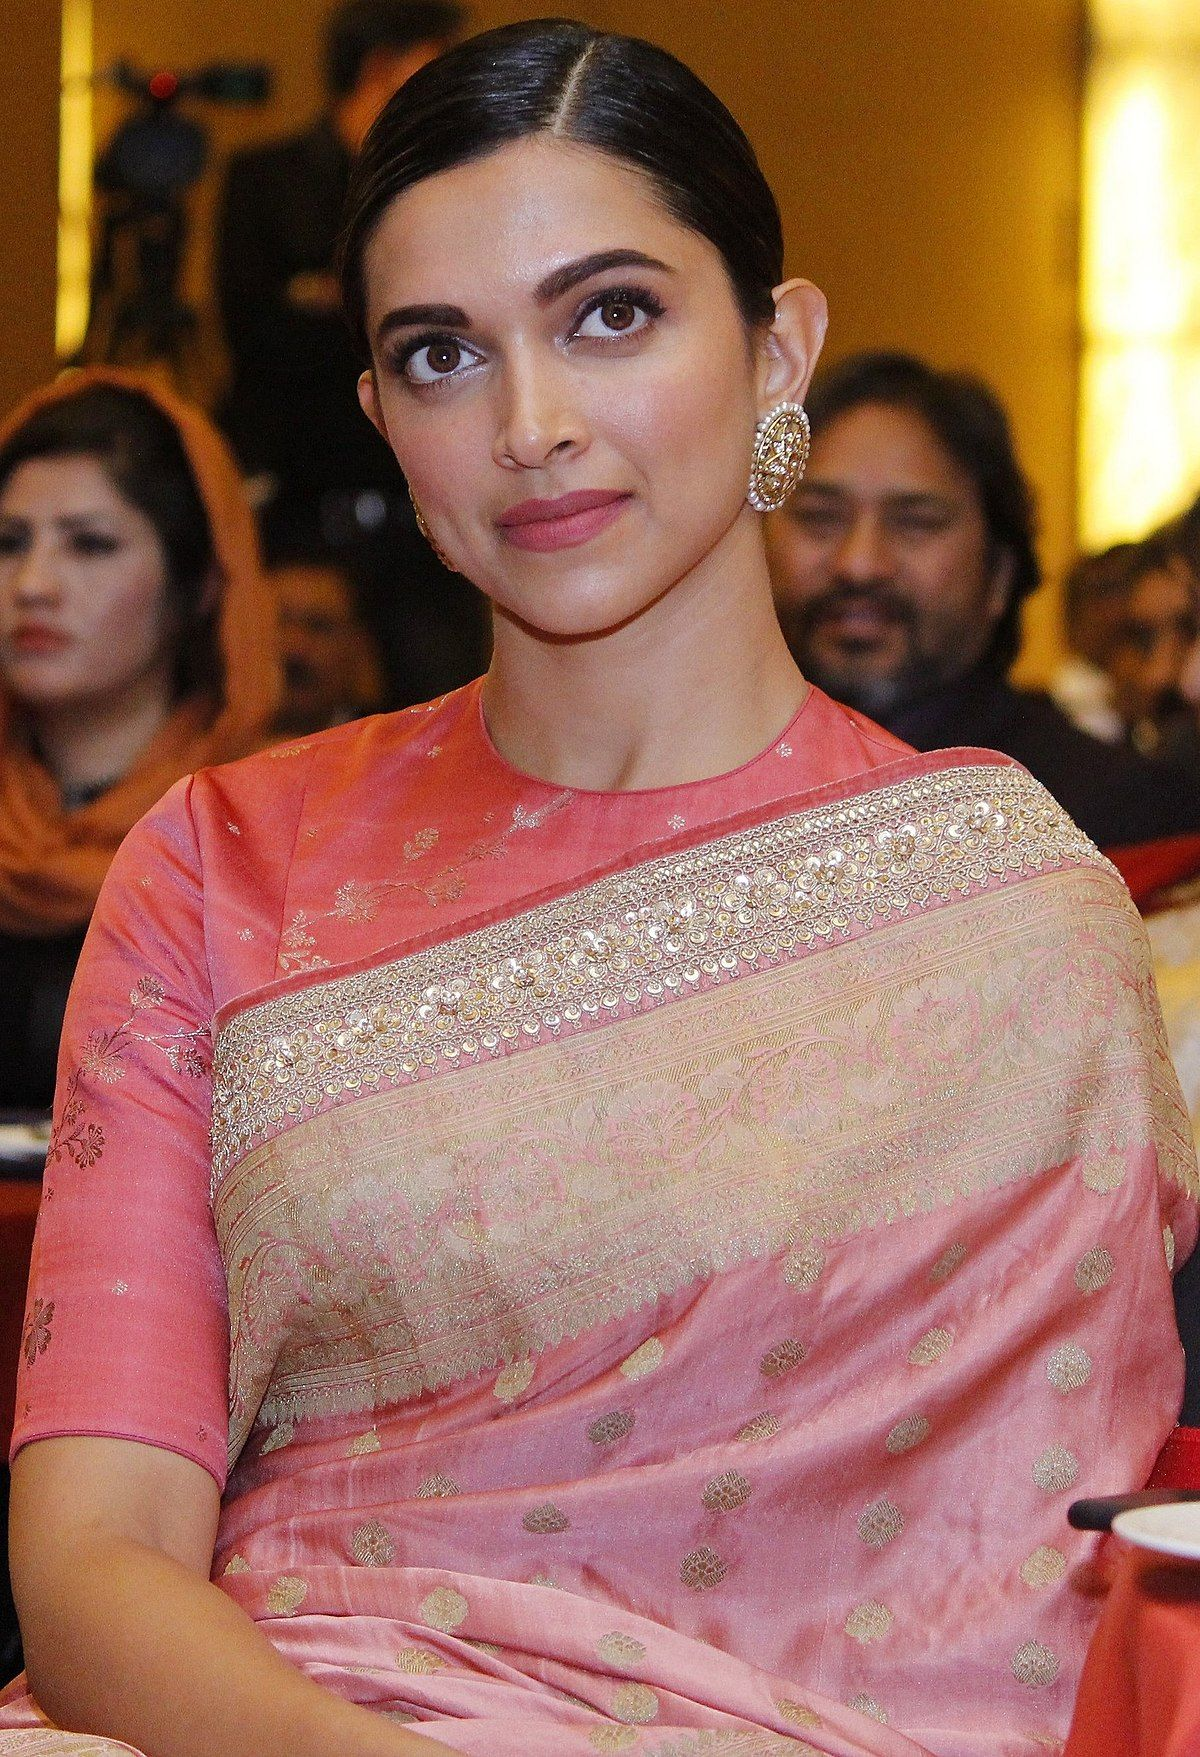 Deepika Padukone - Wikipedia | Peach saree, Deepika ...